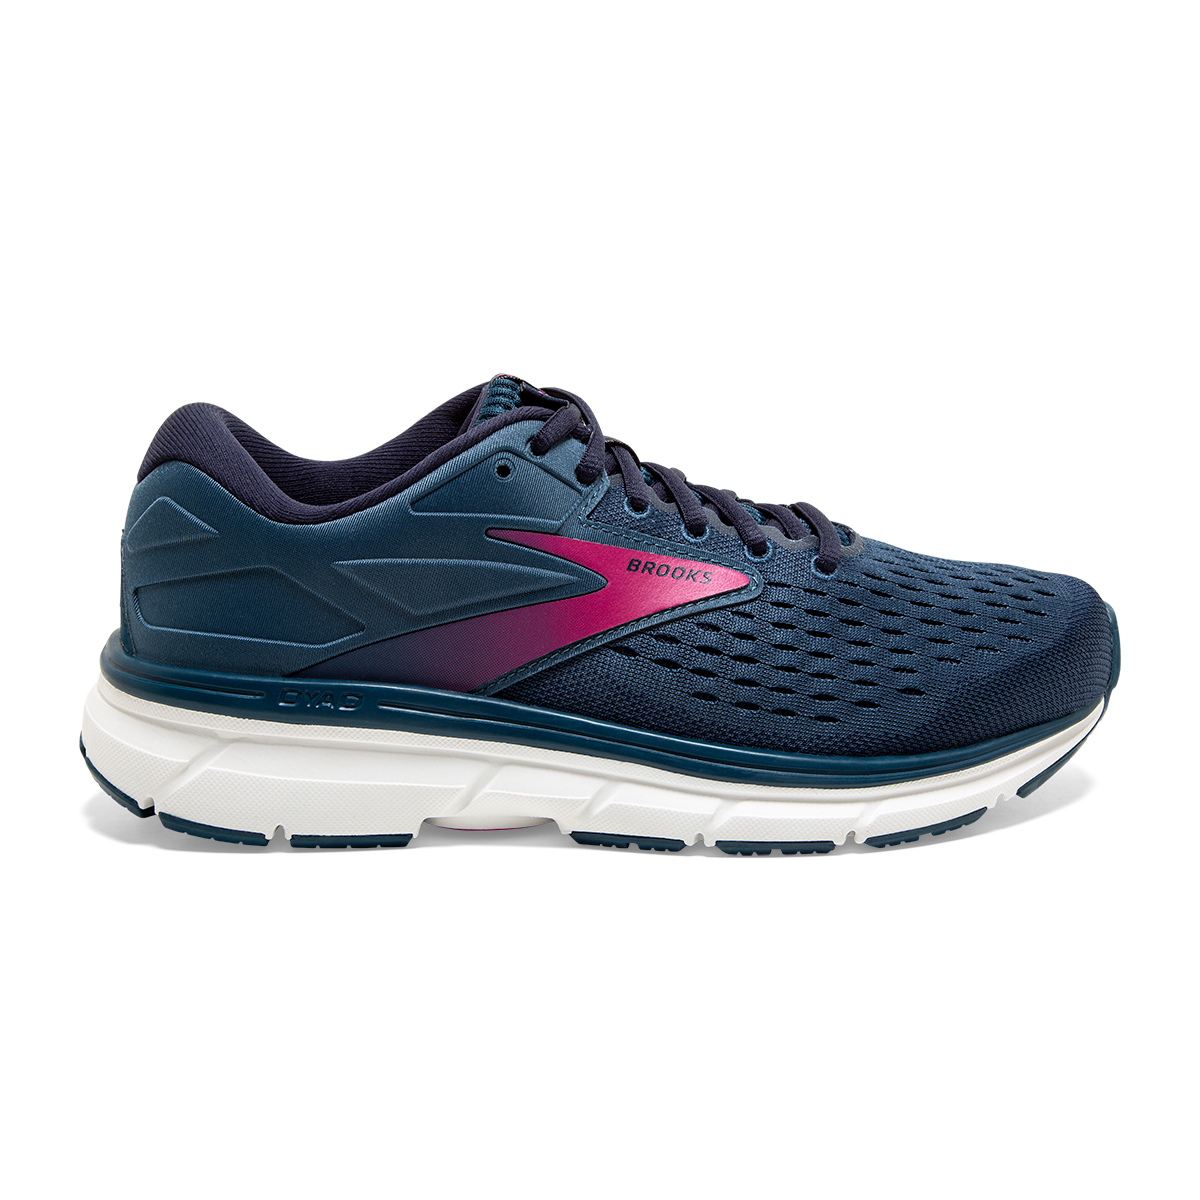 Women's Brooks Dyad 11 Running Shoe - Color: Blue/Navy/Beetroot (Regular Width) - Size: 7.5, Blue/Navy/Beetroot, large, image 1